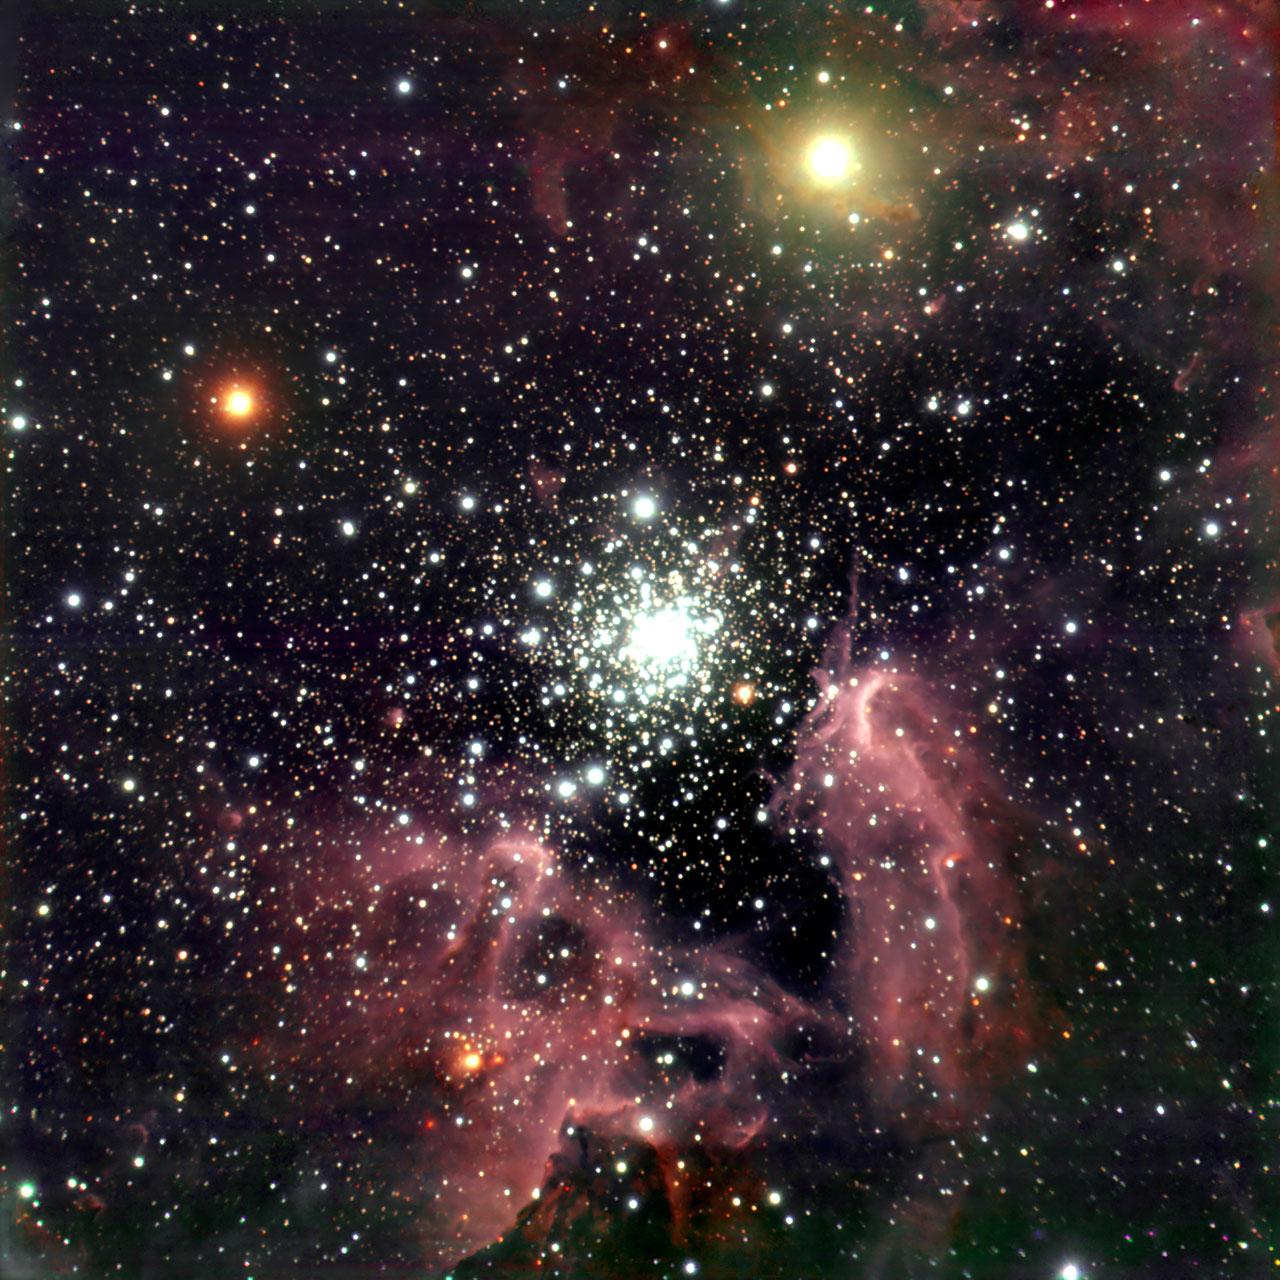 Mounted image 027: The Galactic starburst region NGC 3603